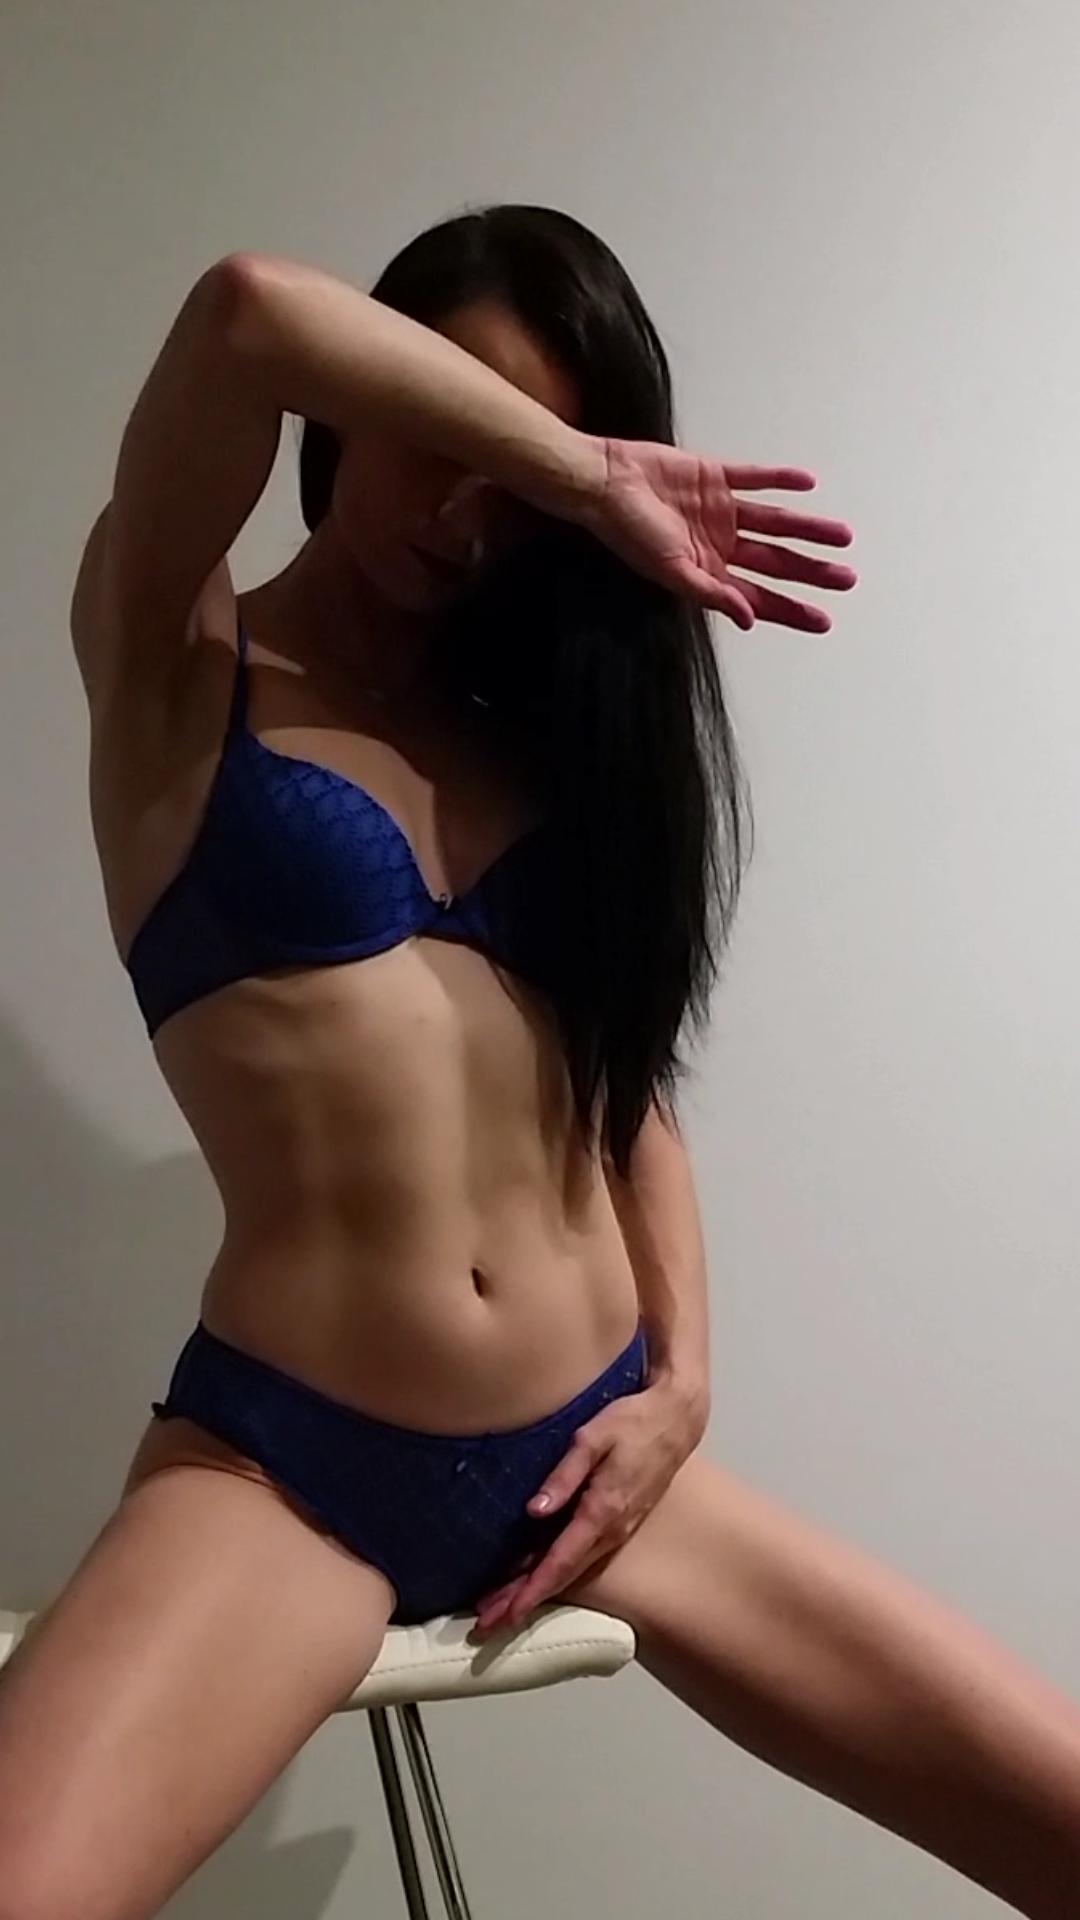 Escort outcalls girls want sex Brisbane